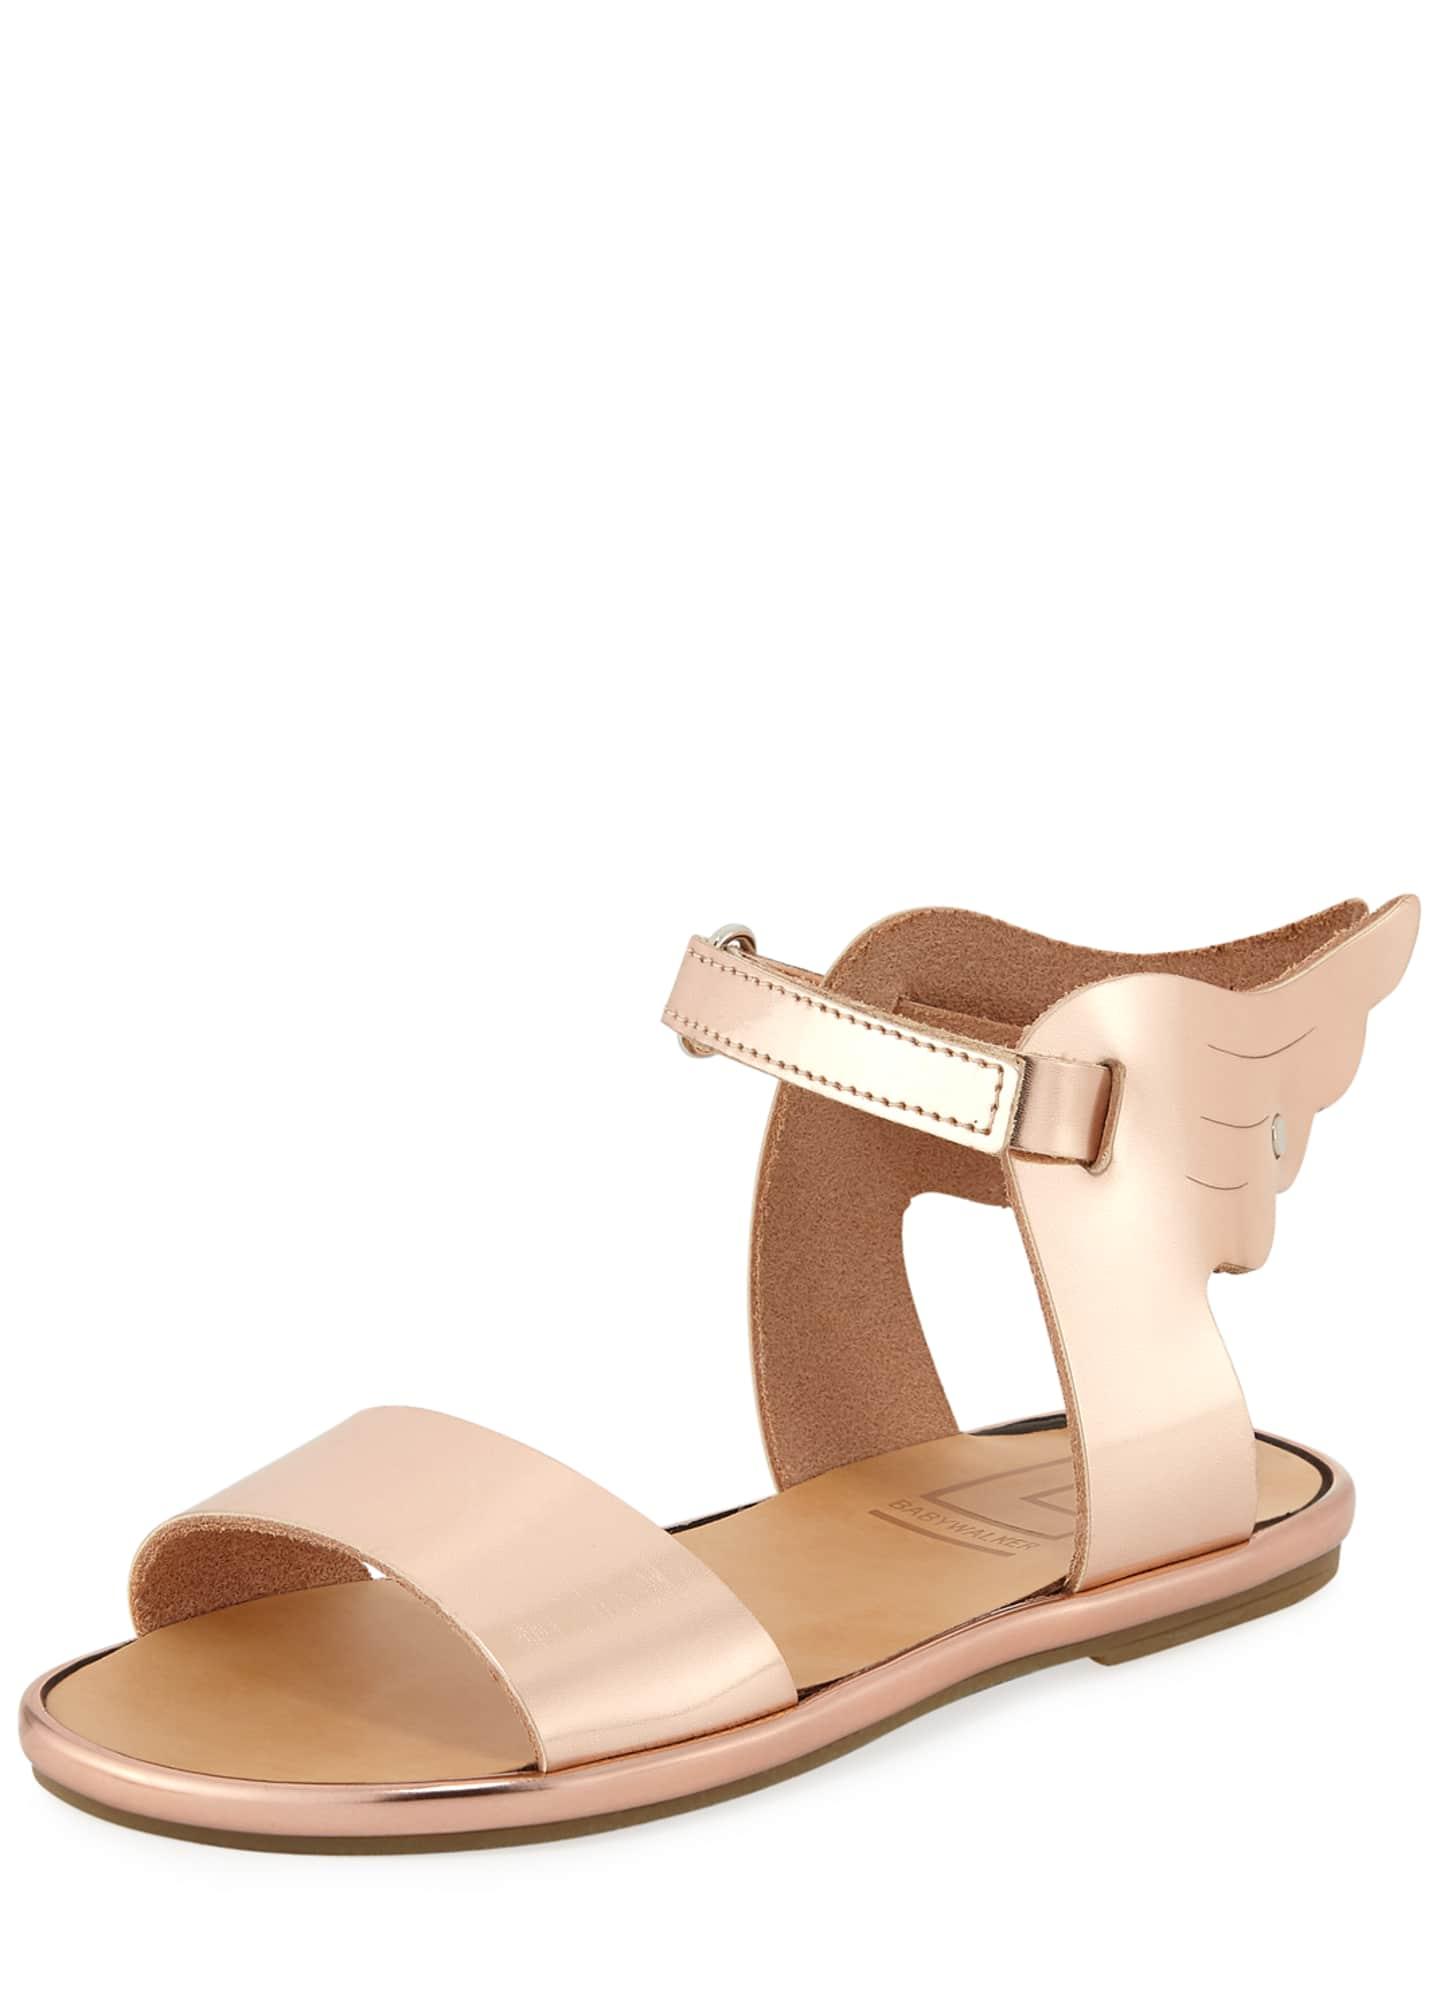 Babywalker Metallic Leather Wing Sandal, Toddler